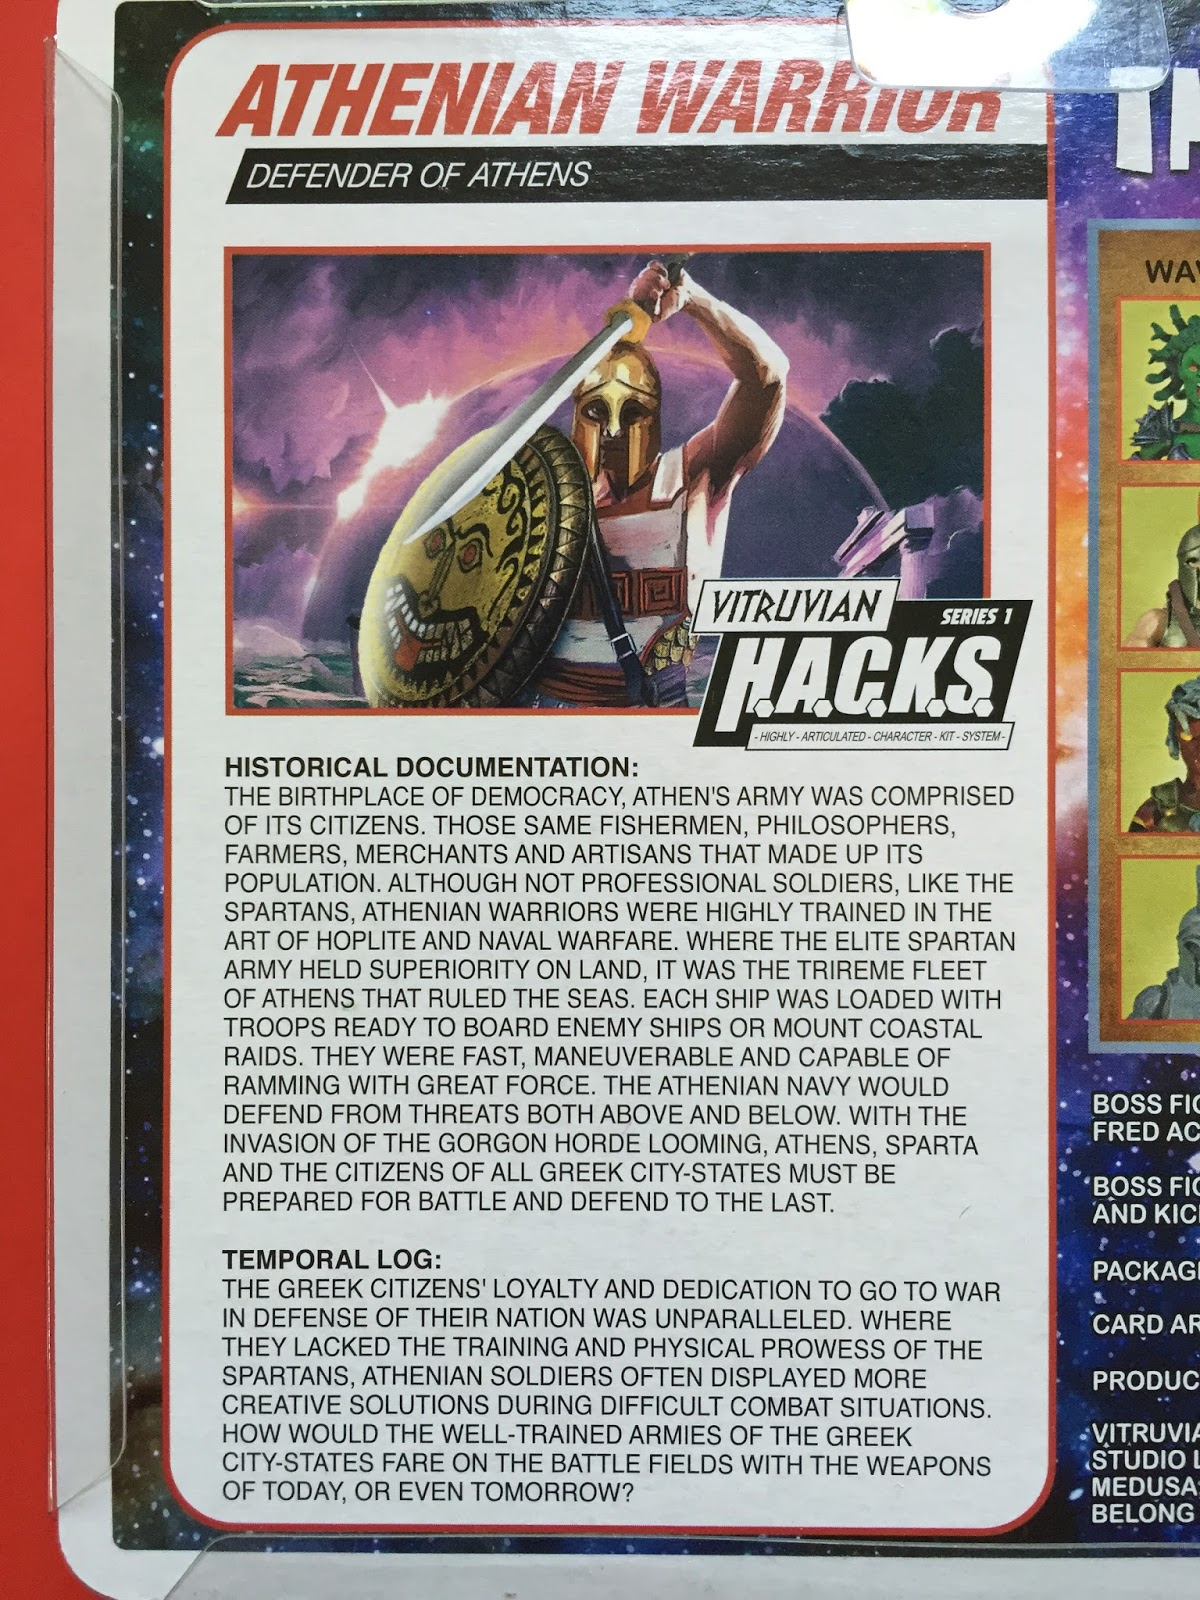 G I  Jigsaw: Boss Fight Studios Vitruvian HACKS Series 1 Wave 2